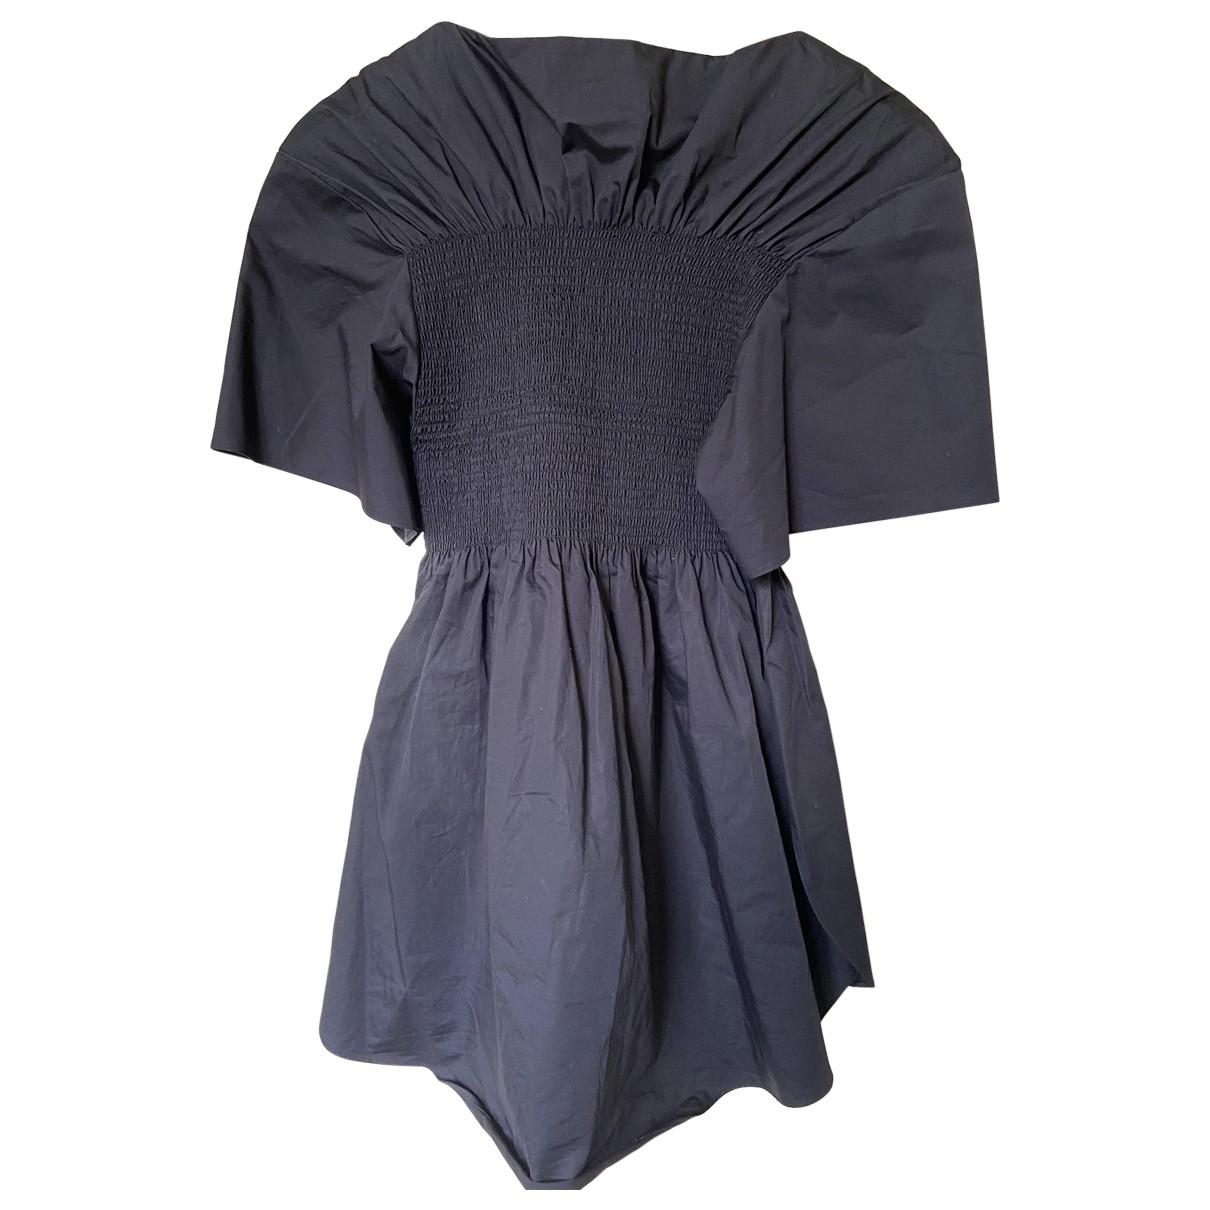 Totême \N Black Cotton  top for Women XS International